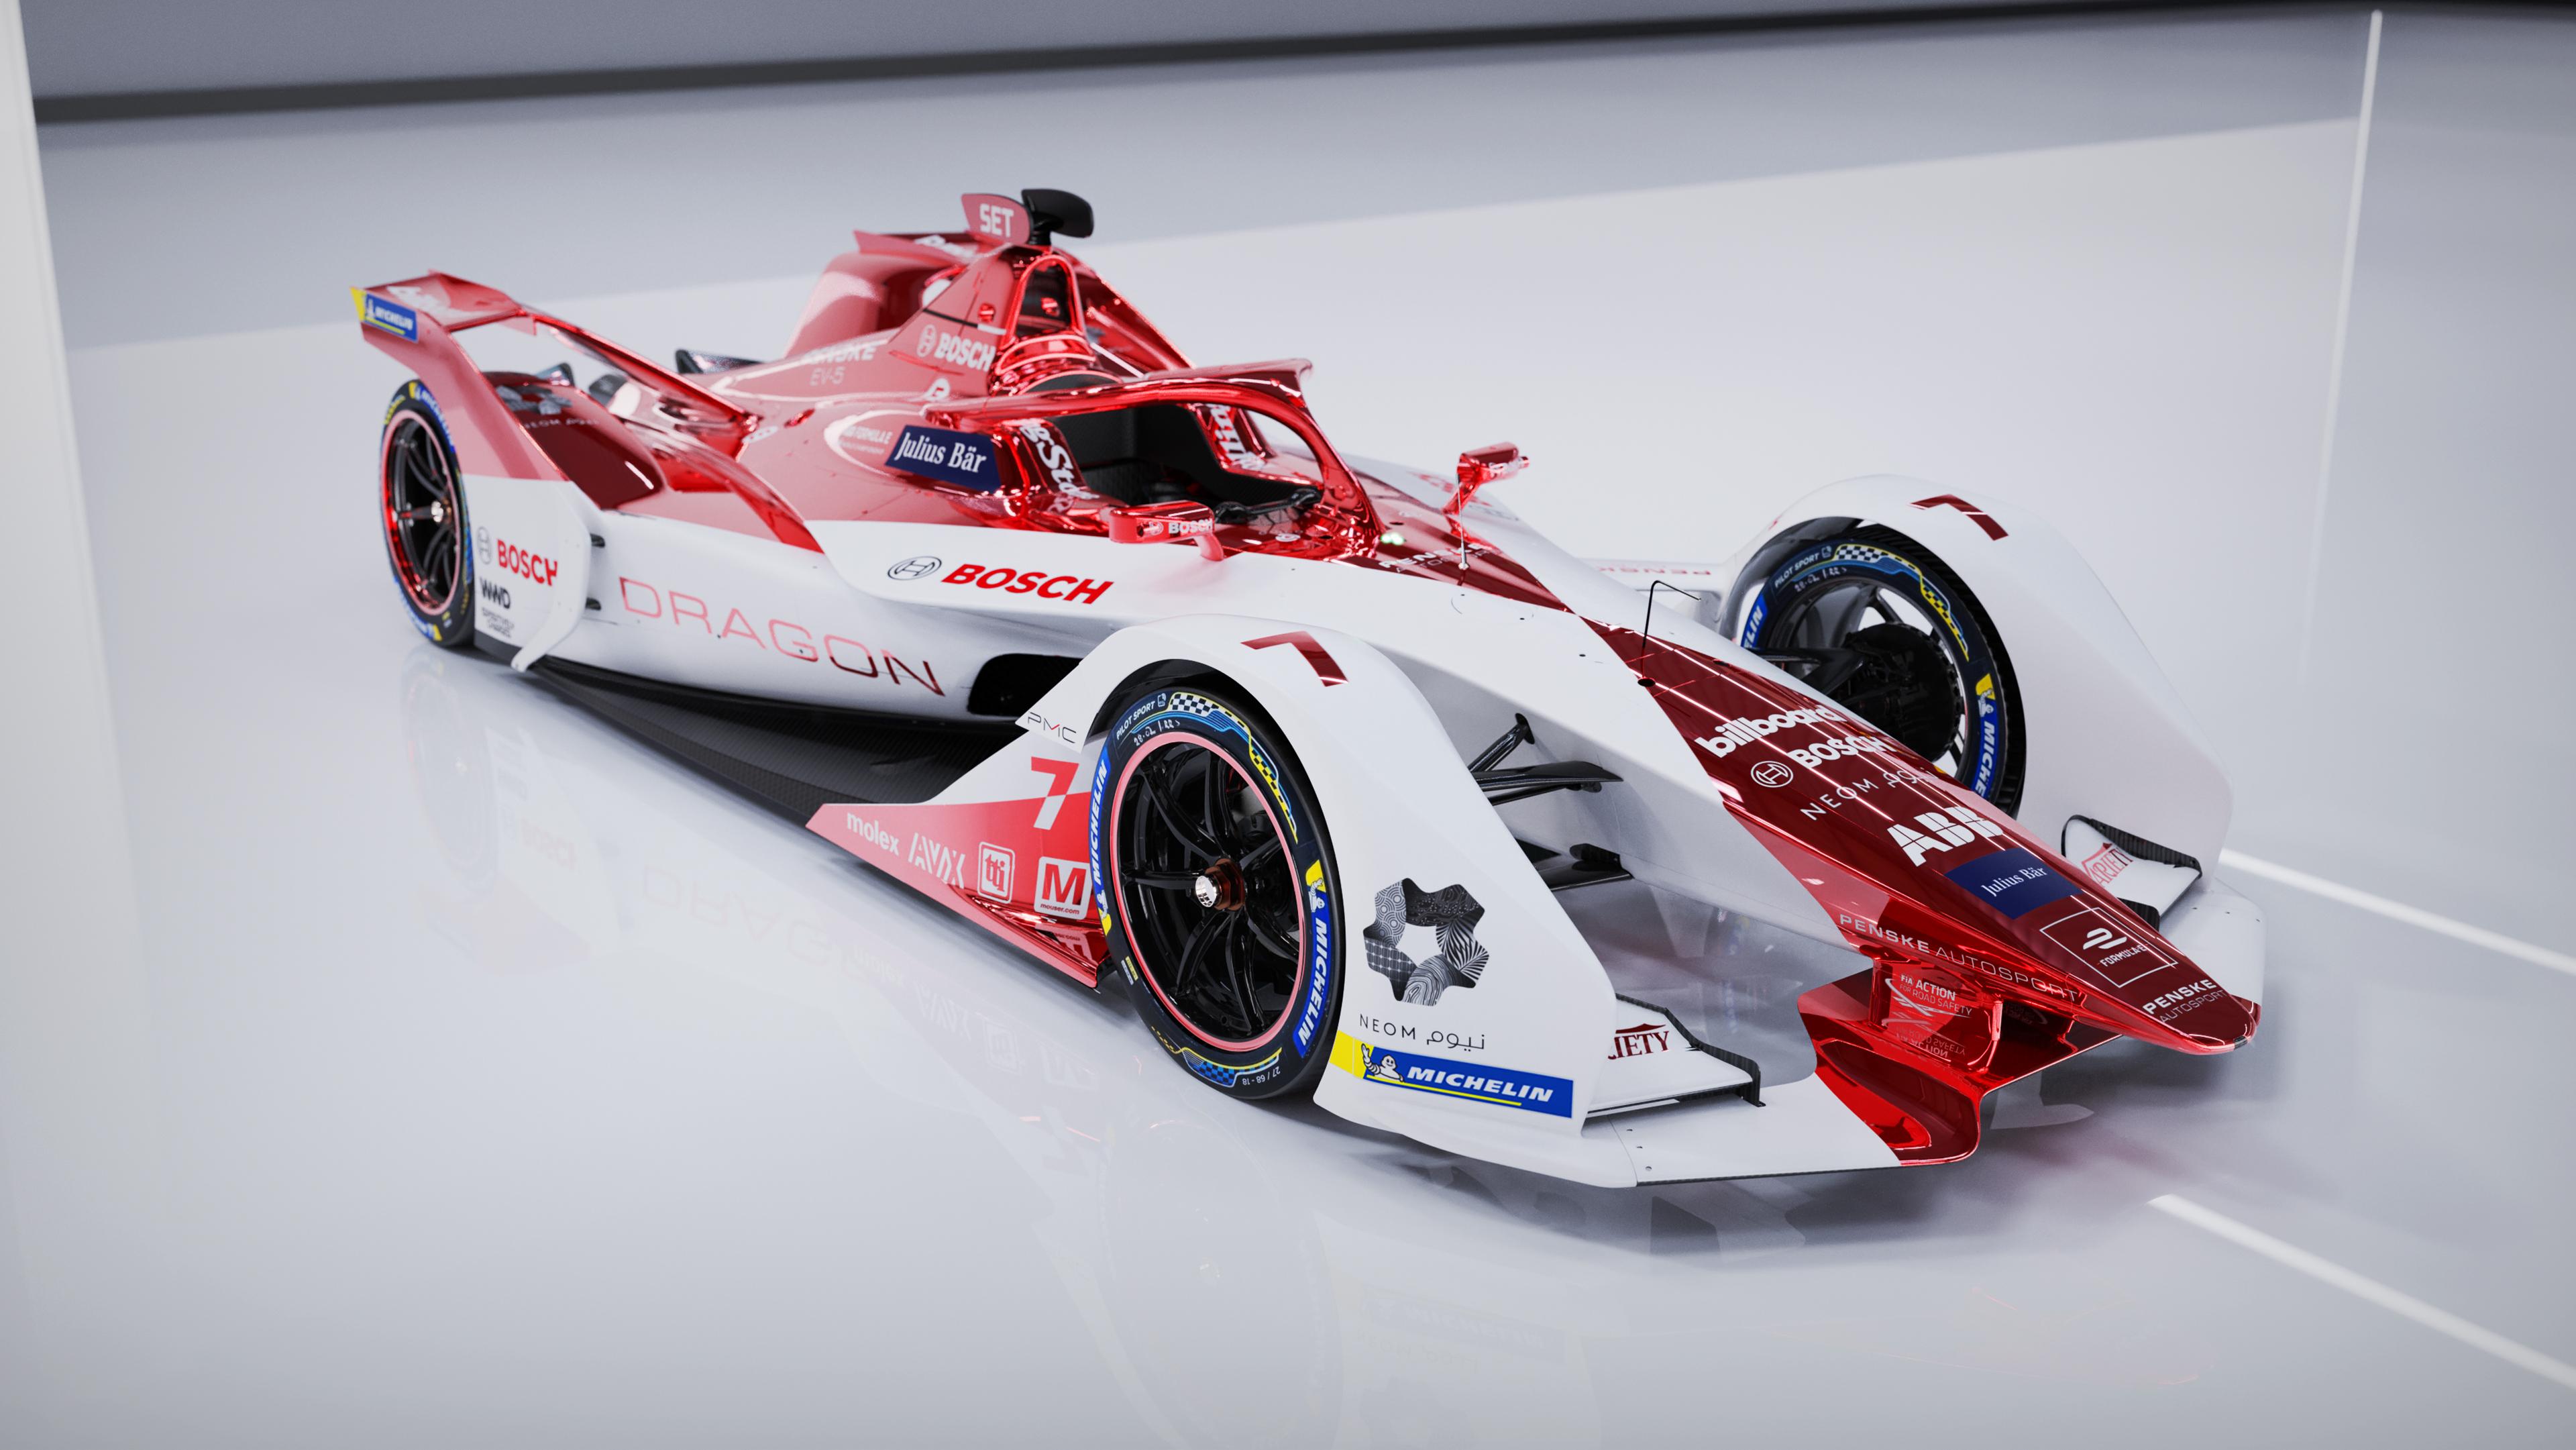 Motoršport pod prúdom: Bosch a DRAGON / PENSKE AUTOSPORT sa dohodli na dlhodobom partnerstve vo Formule E